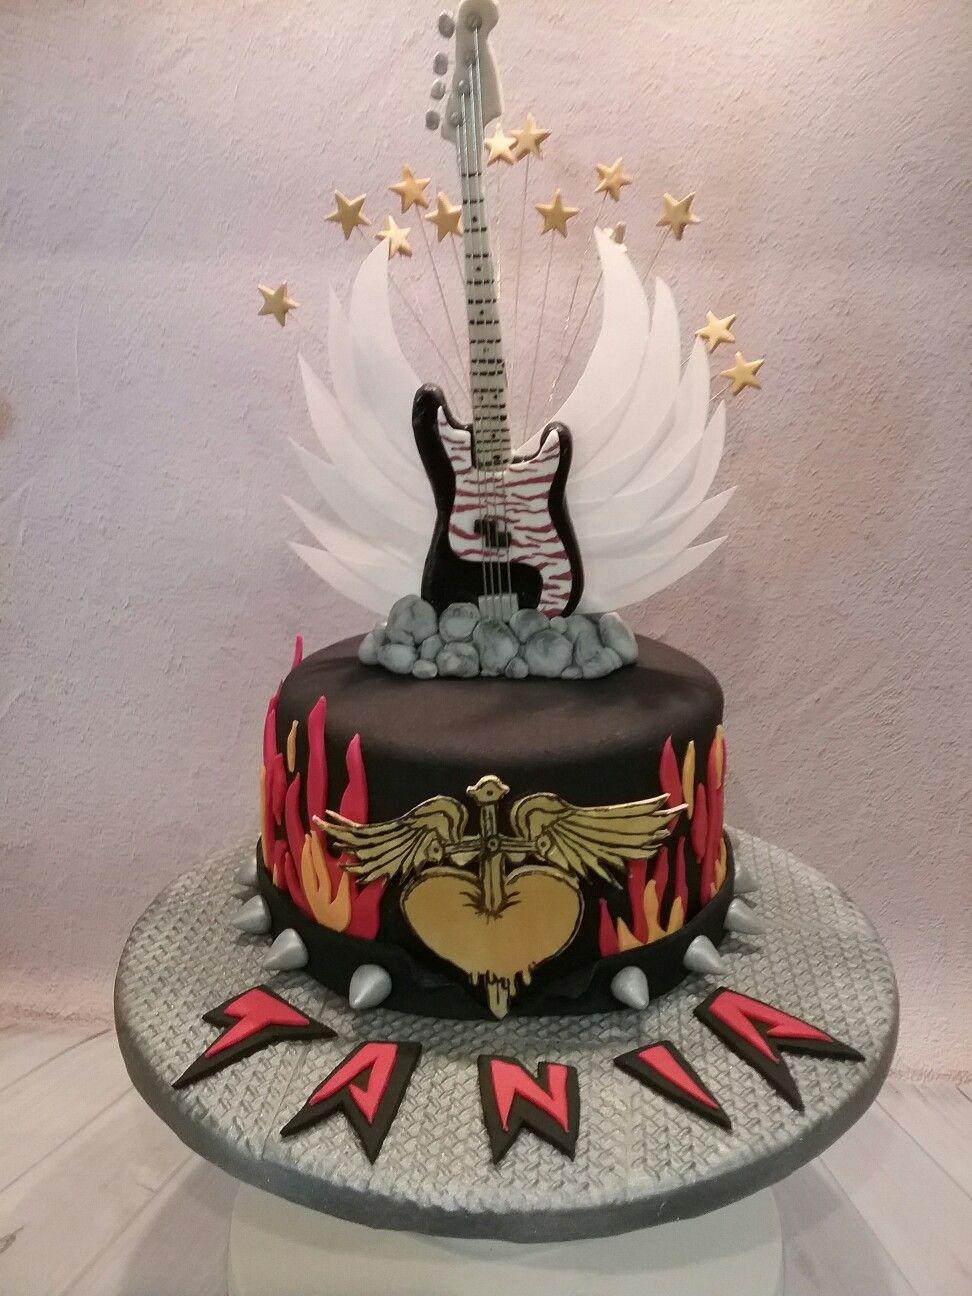 Rock n roll guitar cake by Dimitra Koniosi Markou